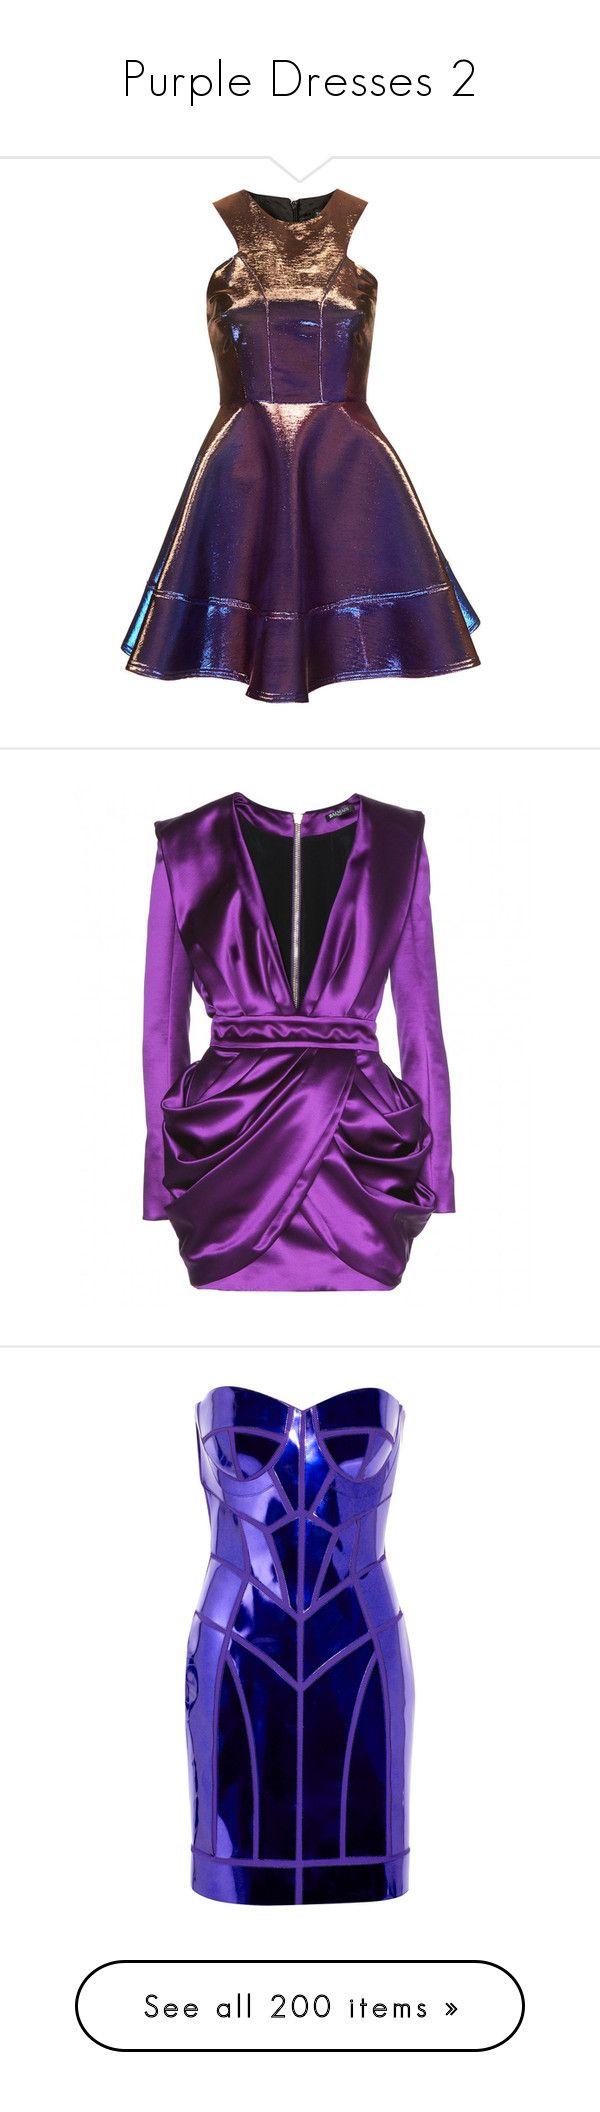 """Purple Dresses 2"" by kingcrimson ❤ liked on Polyvore featuring dresses, topshop, vestidos, short dresses, blue, metallic short dress, metallic mini dress, topshop dresses, purple skater dress and metallic skater dress"